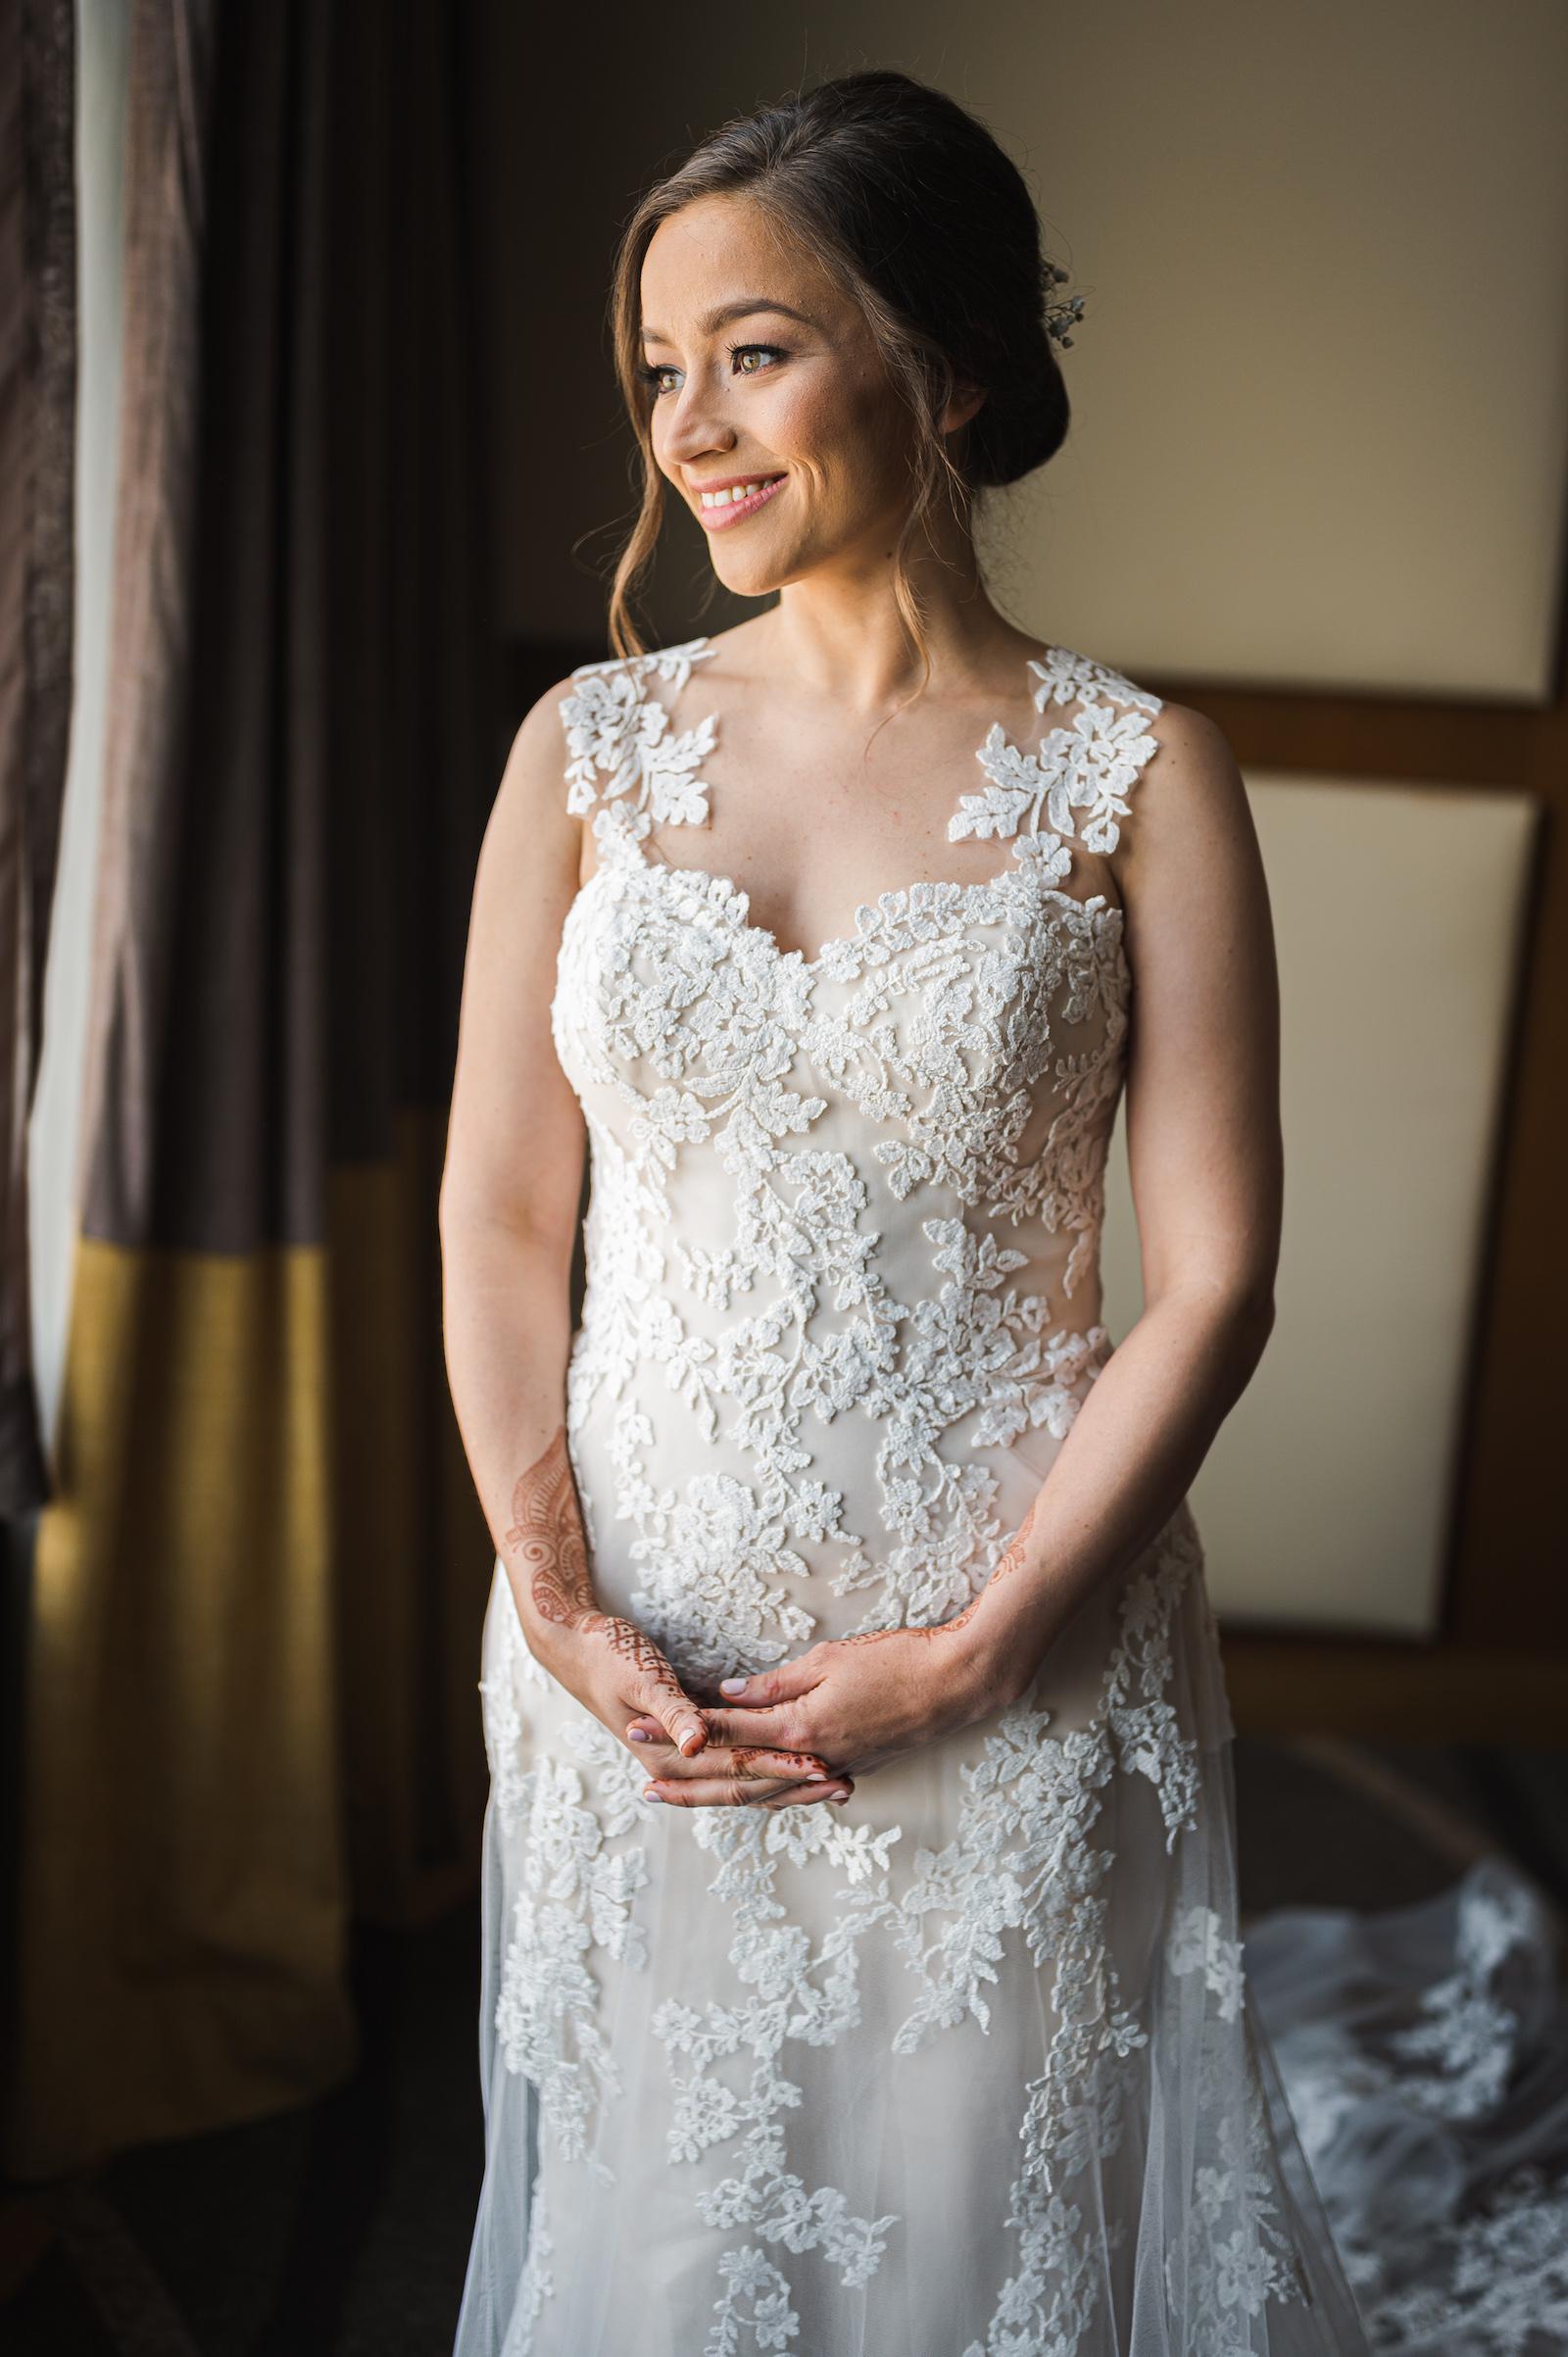 Bridal dress: Charming Indian Wedding featured on Nashville Bride Guide